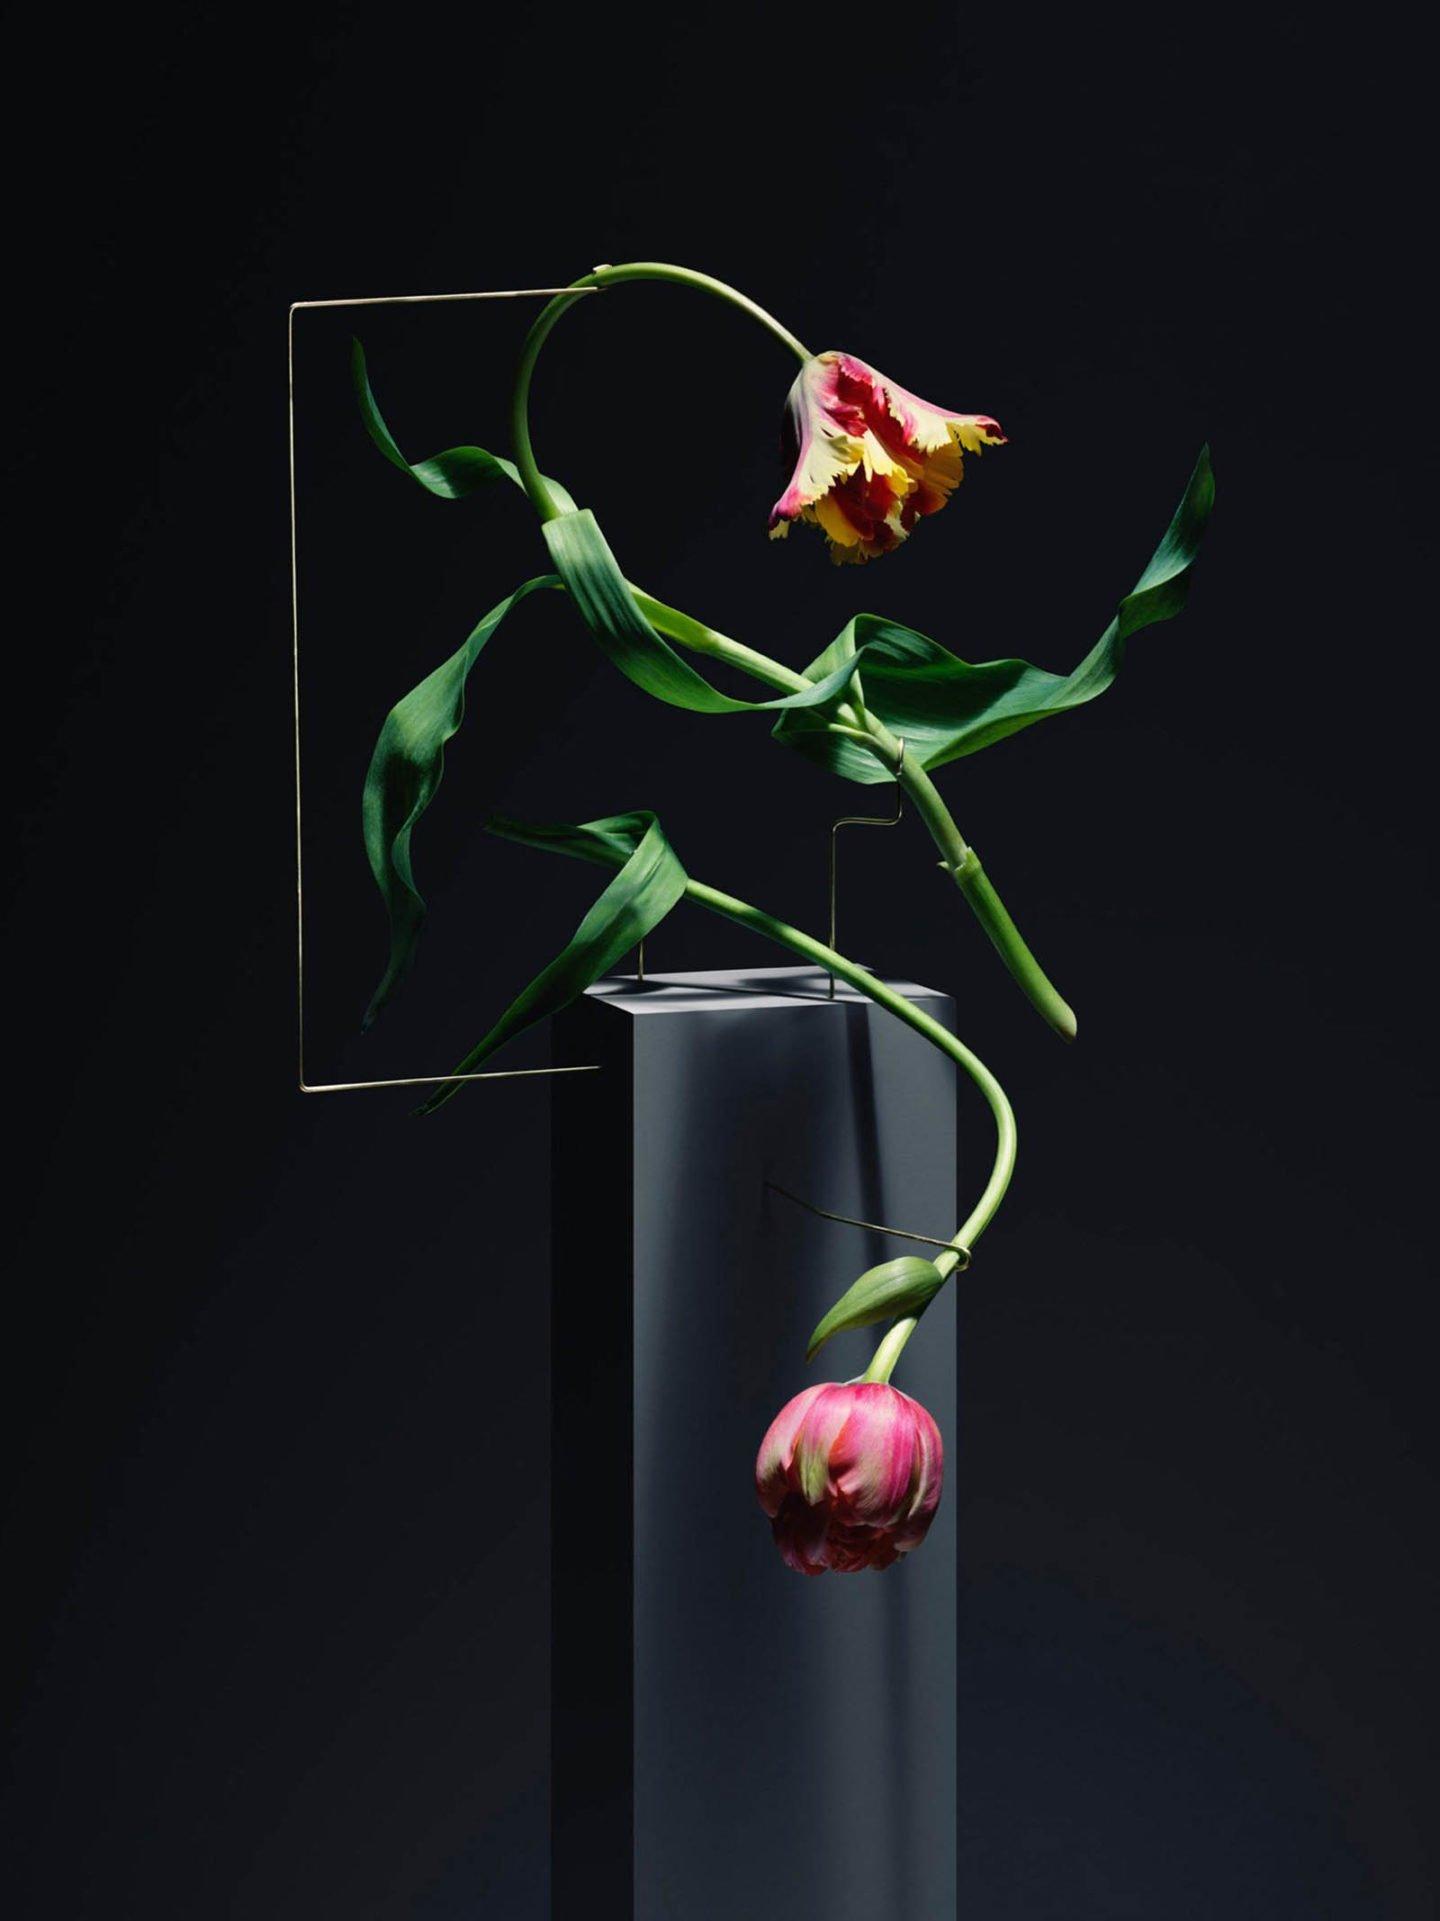 ignant-art-carl-kleiner-postures-004-1440x1921